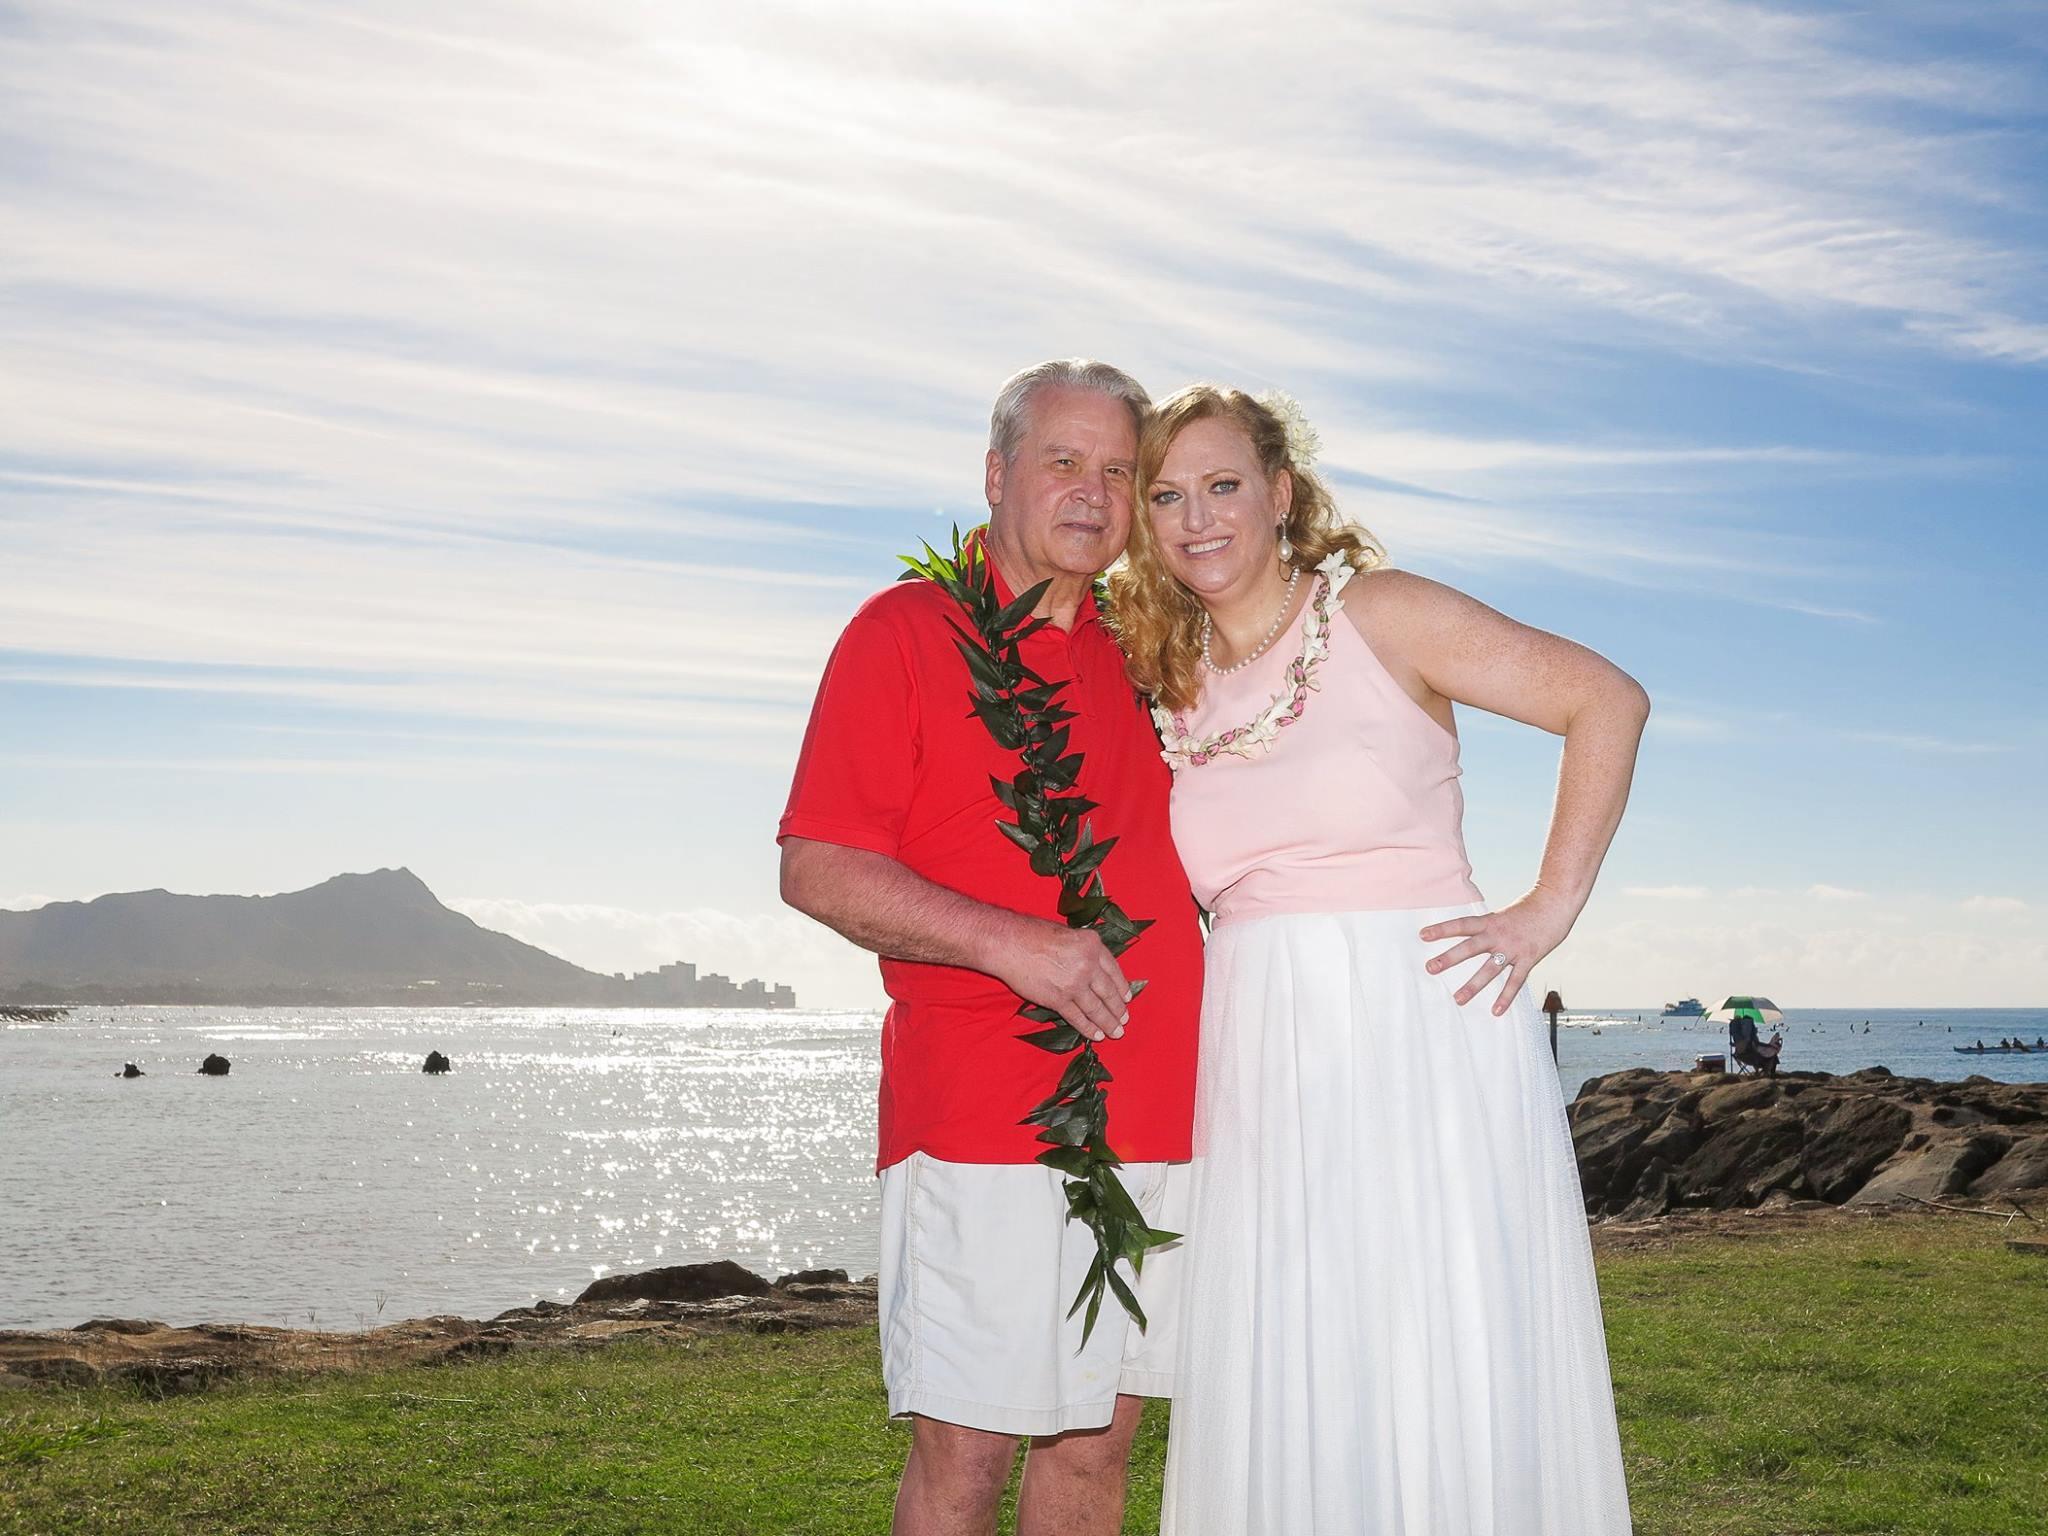 Julie-Harmon-Flowers BRIDEZILLA! Nightmare Hawaii Wedding Client ~ Please Read